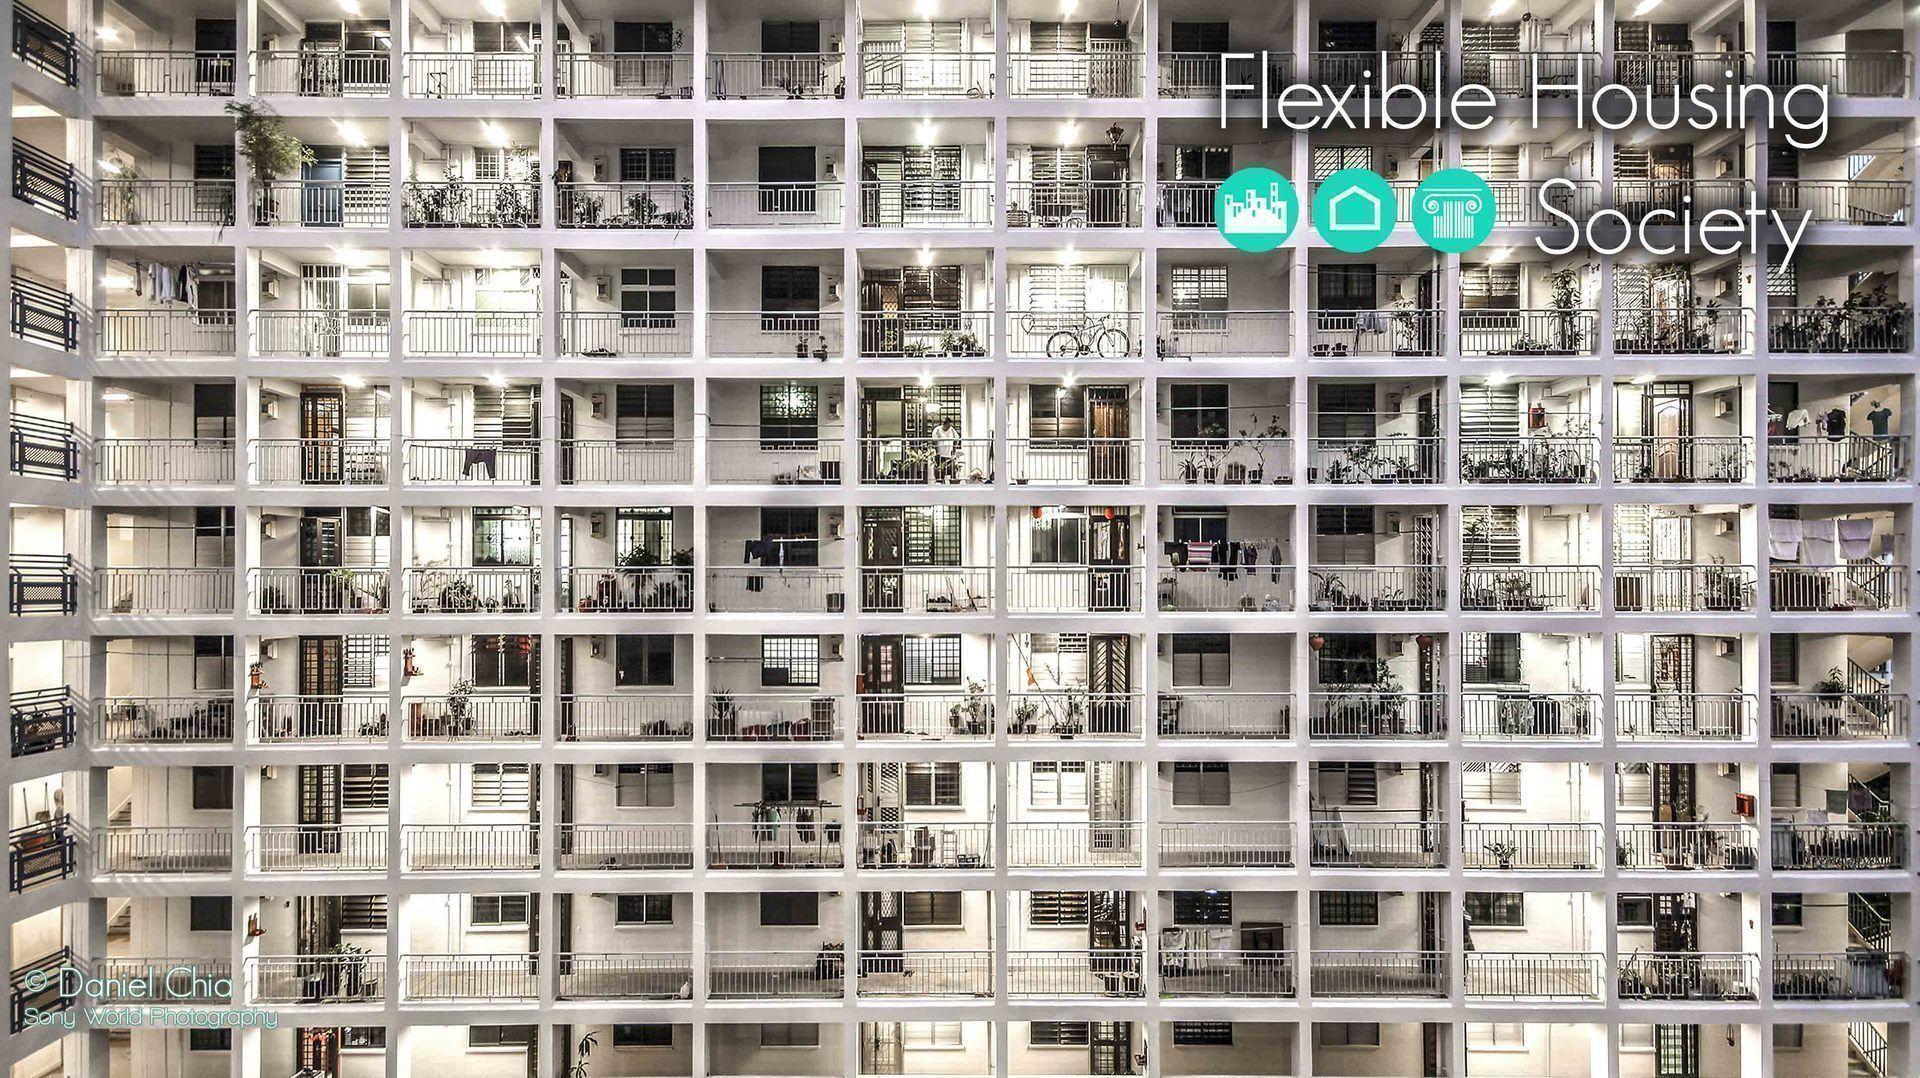 Concurso reTHINKING: Flexible housing [society]